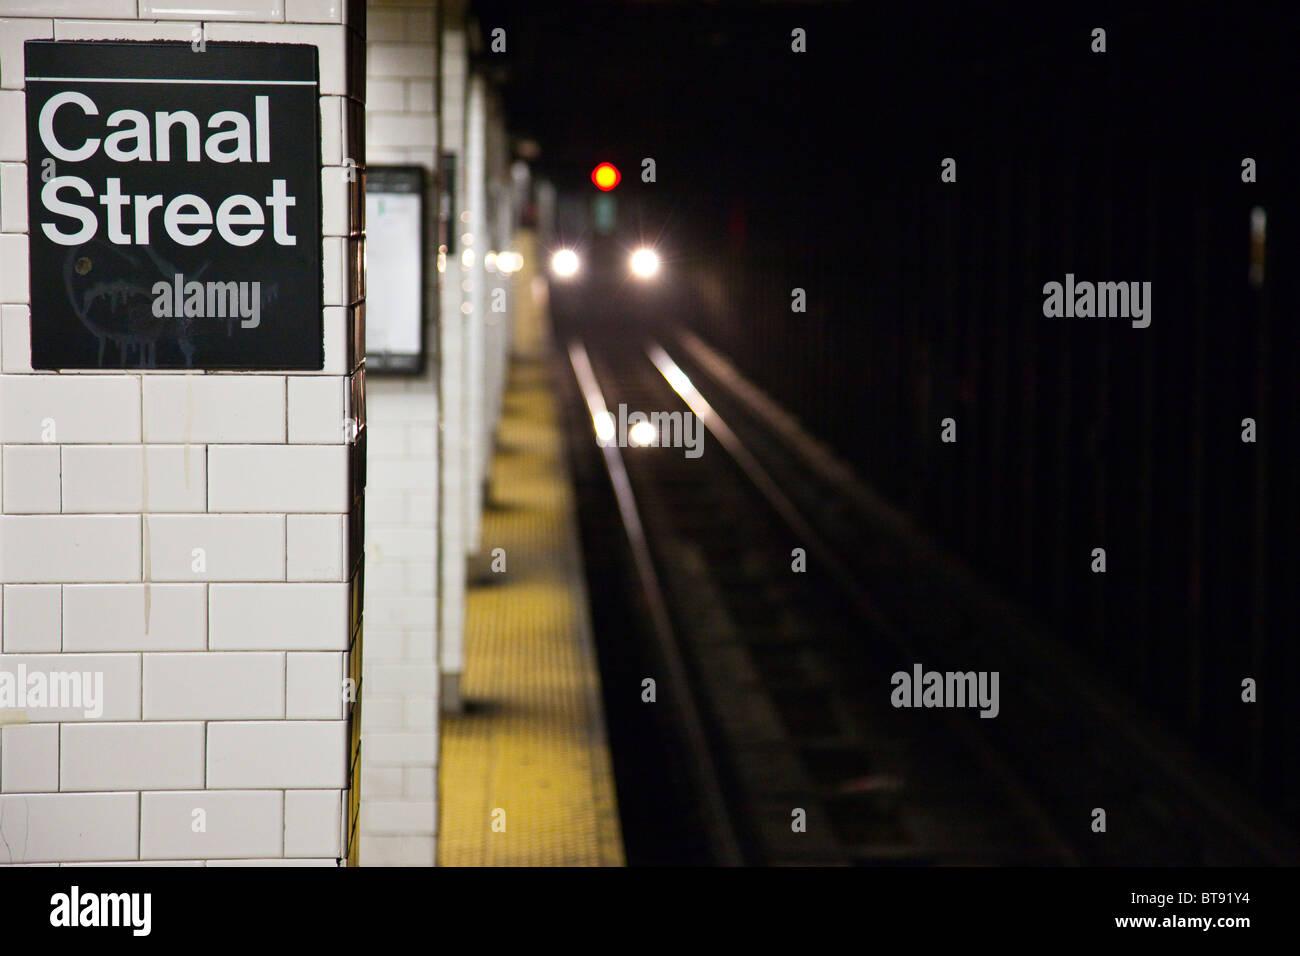 Canal Street Subway Station Platform, Manhattan, New York City - Stock Image